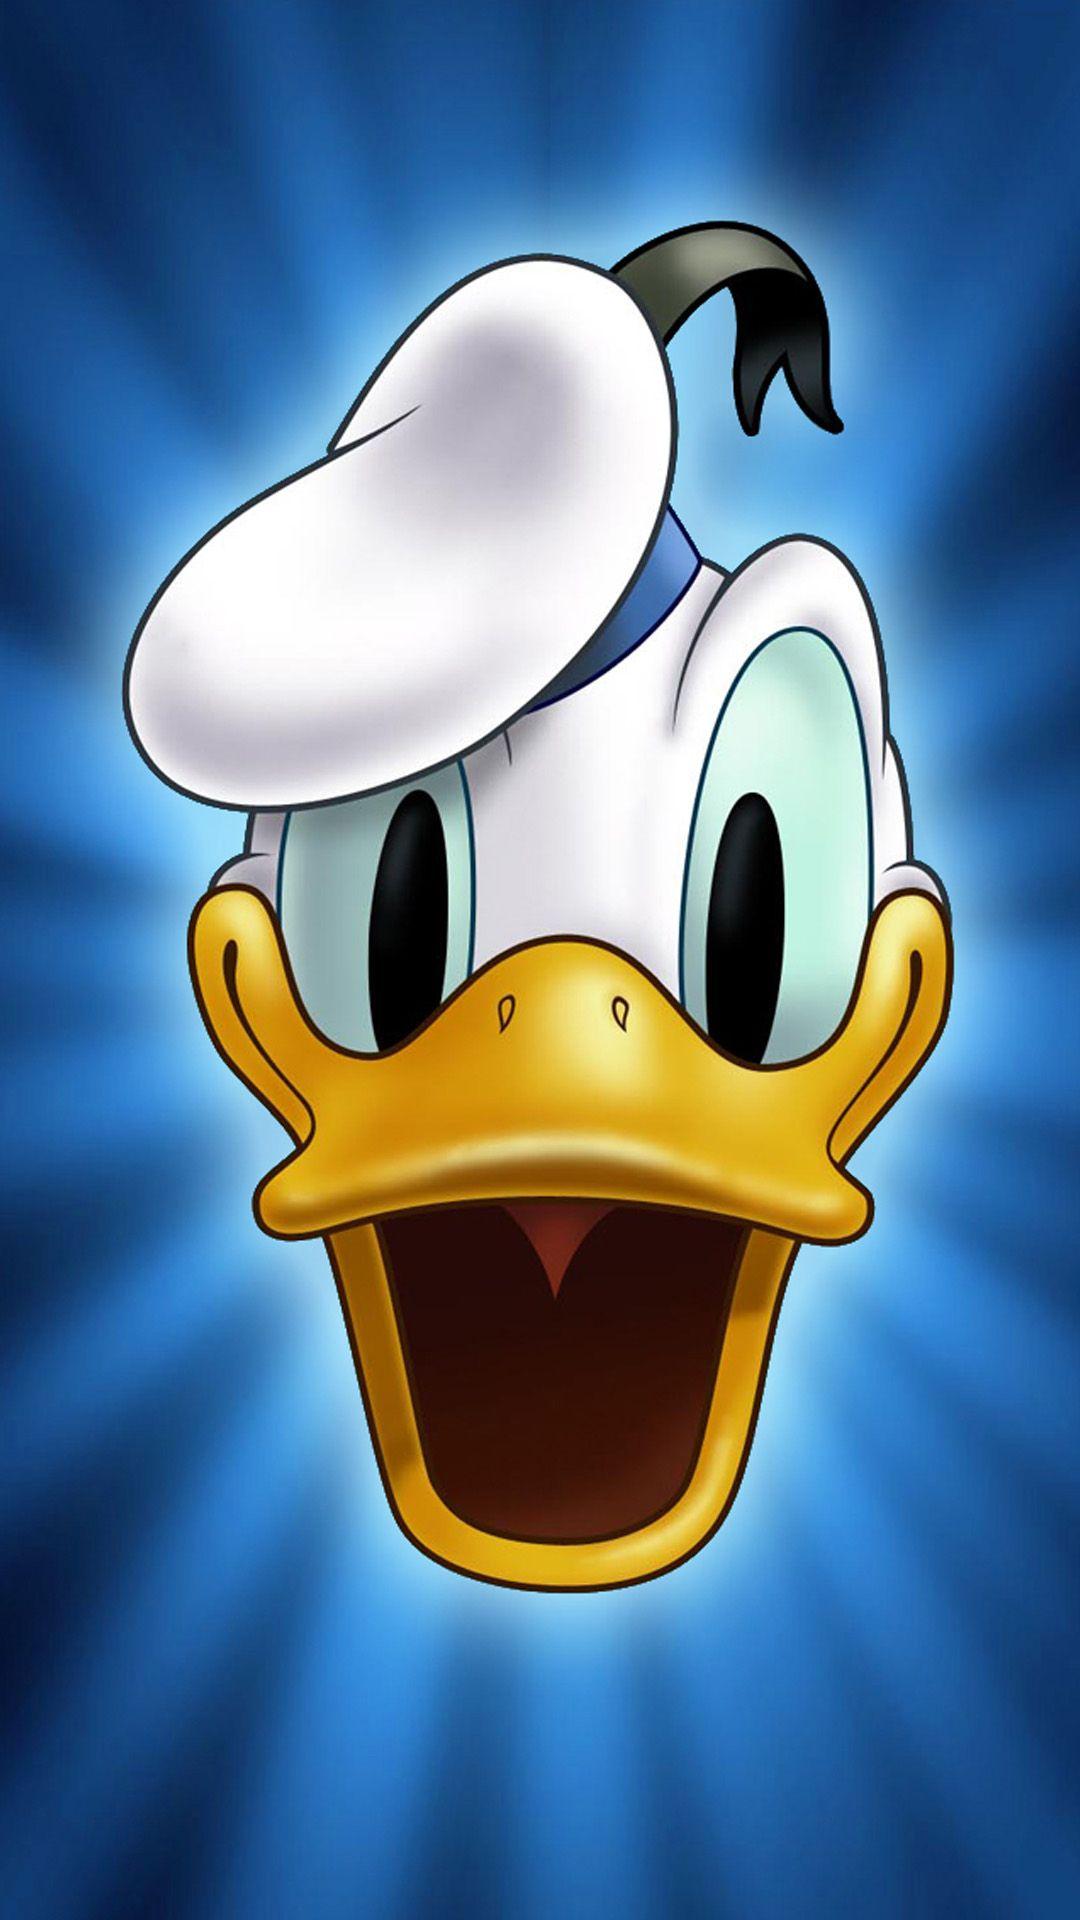 Cute Cartoon Donald Duck Face iPhone 6 plus wallpaper